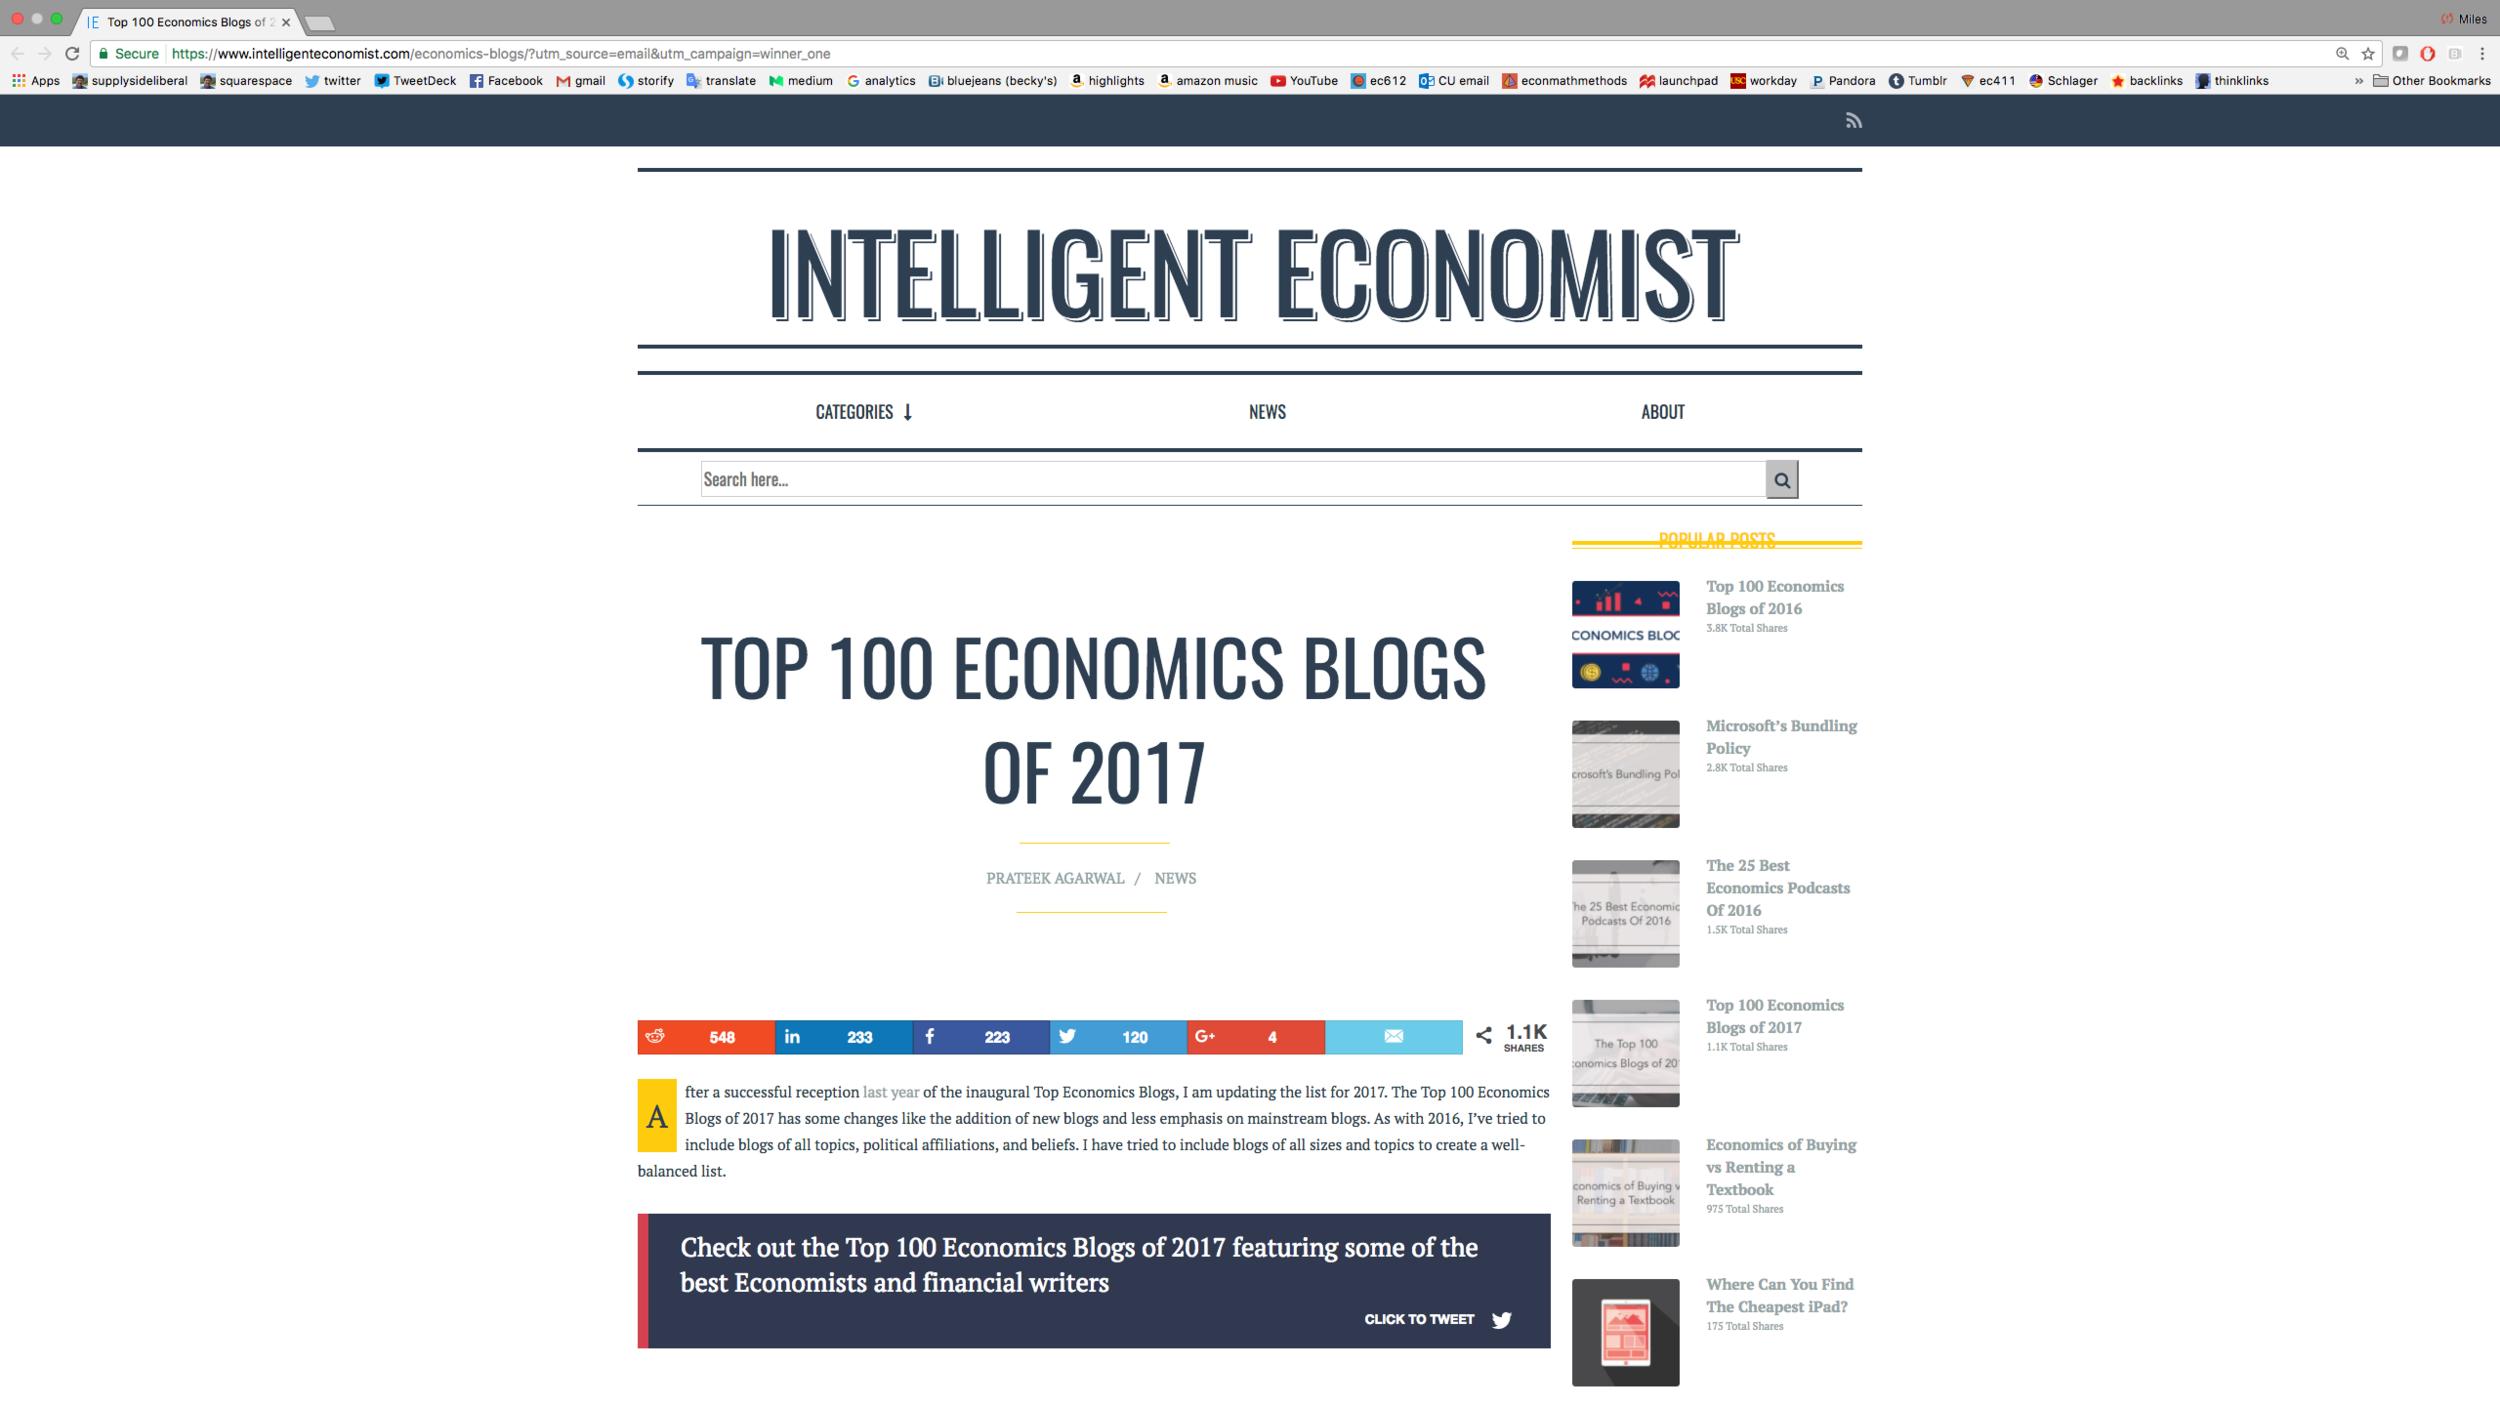 Link to Intelligent Economist's top 100 list of economics blogs